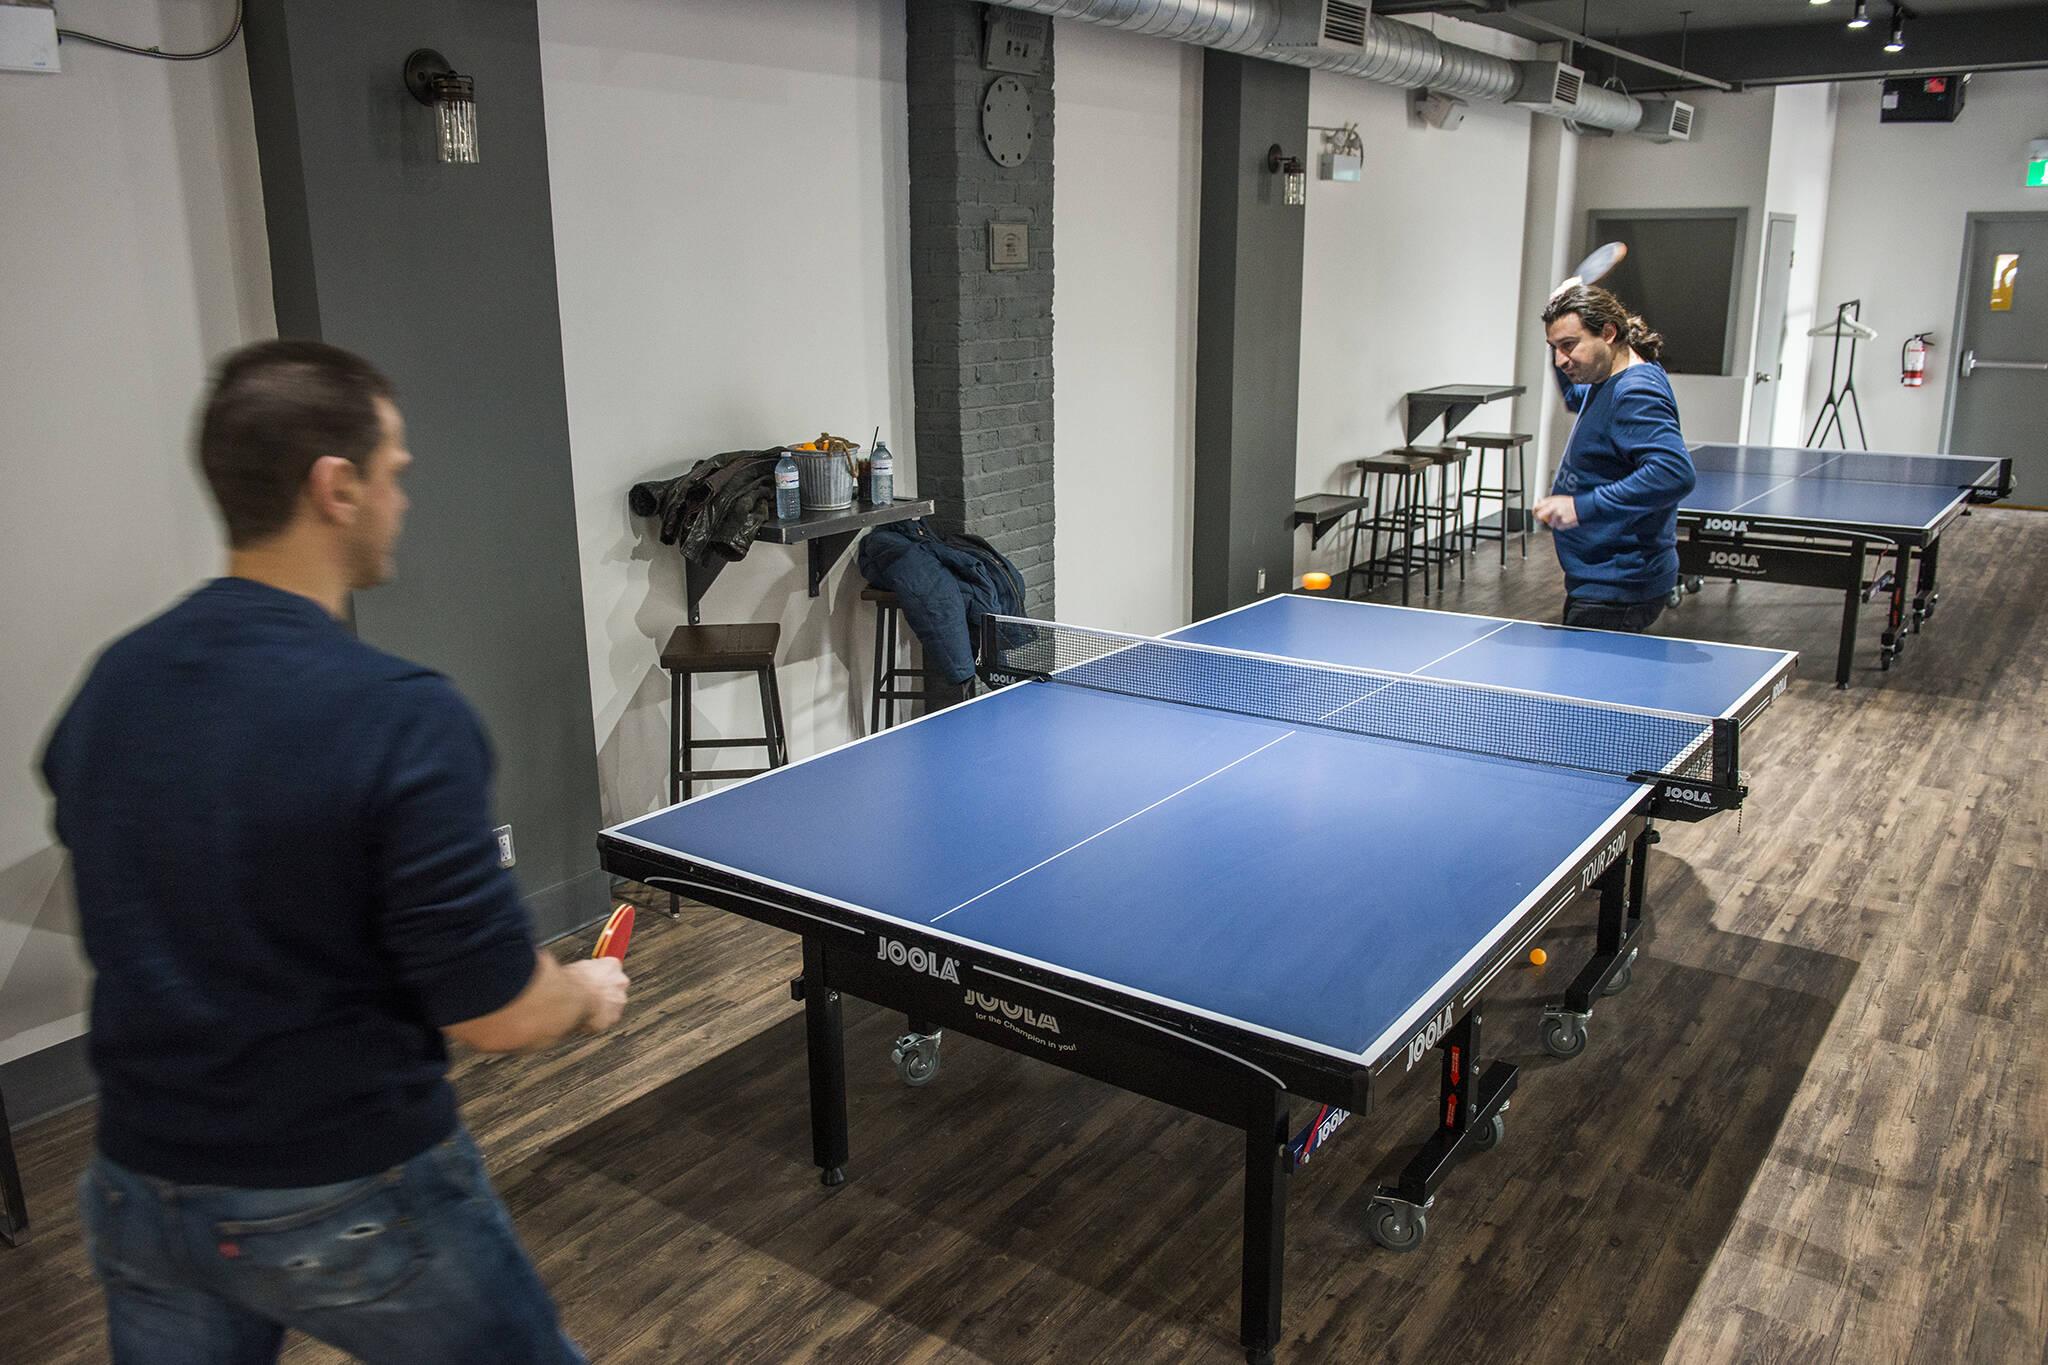 Smash Ping Pong Lounge Toronto